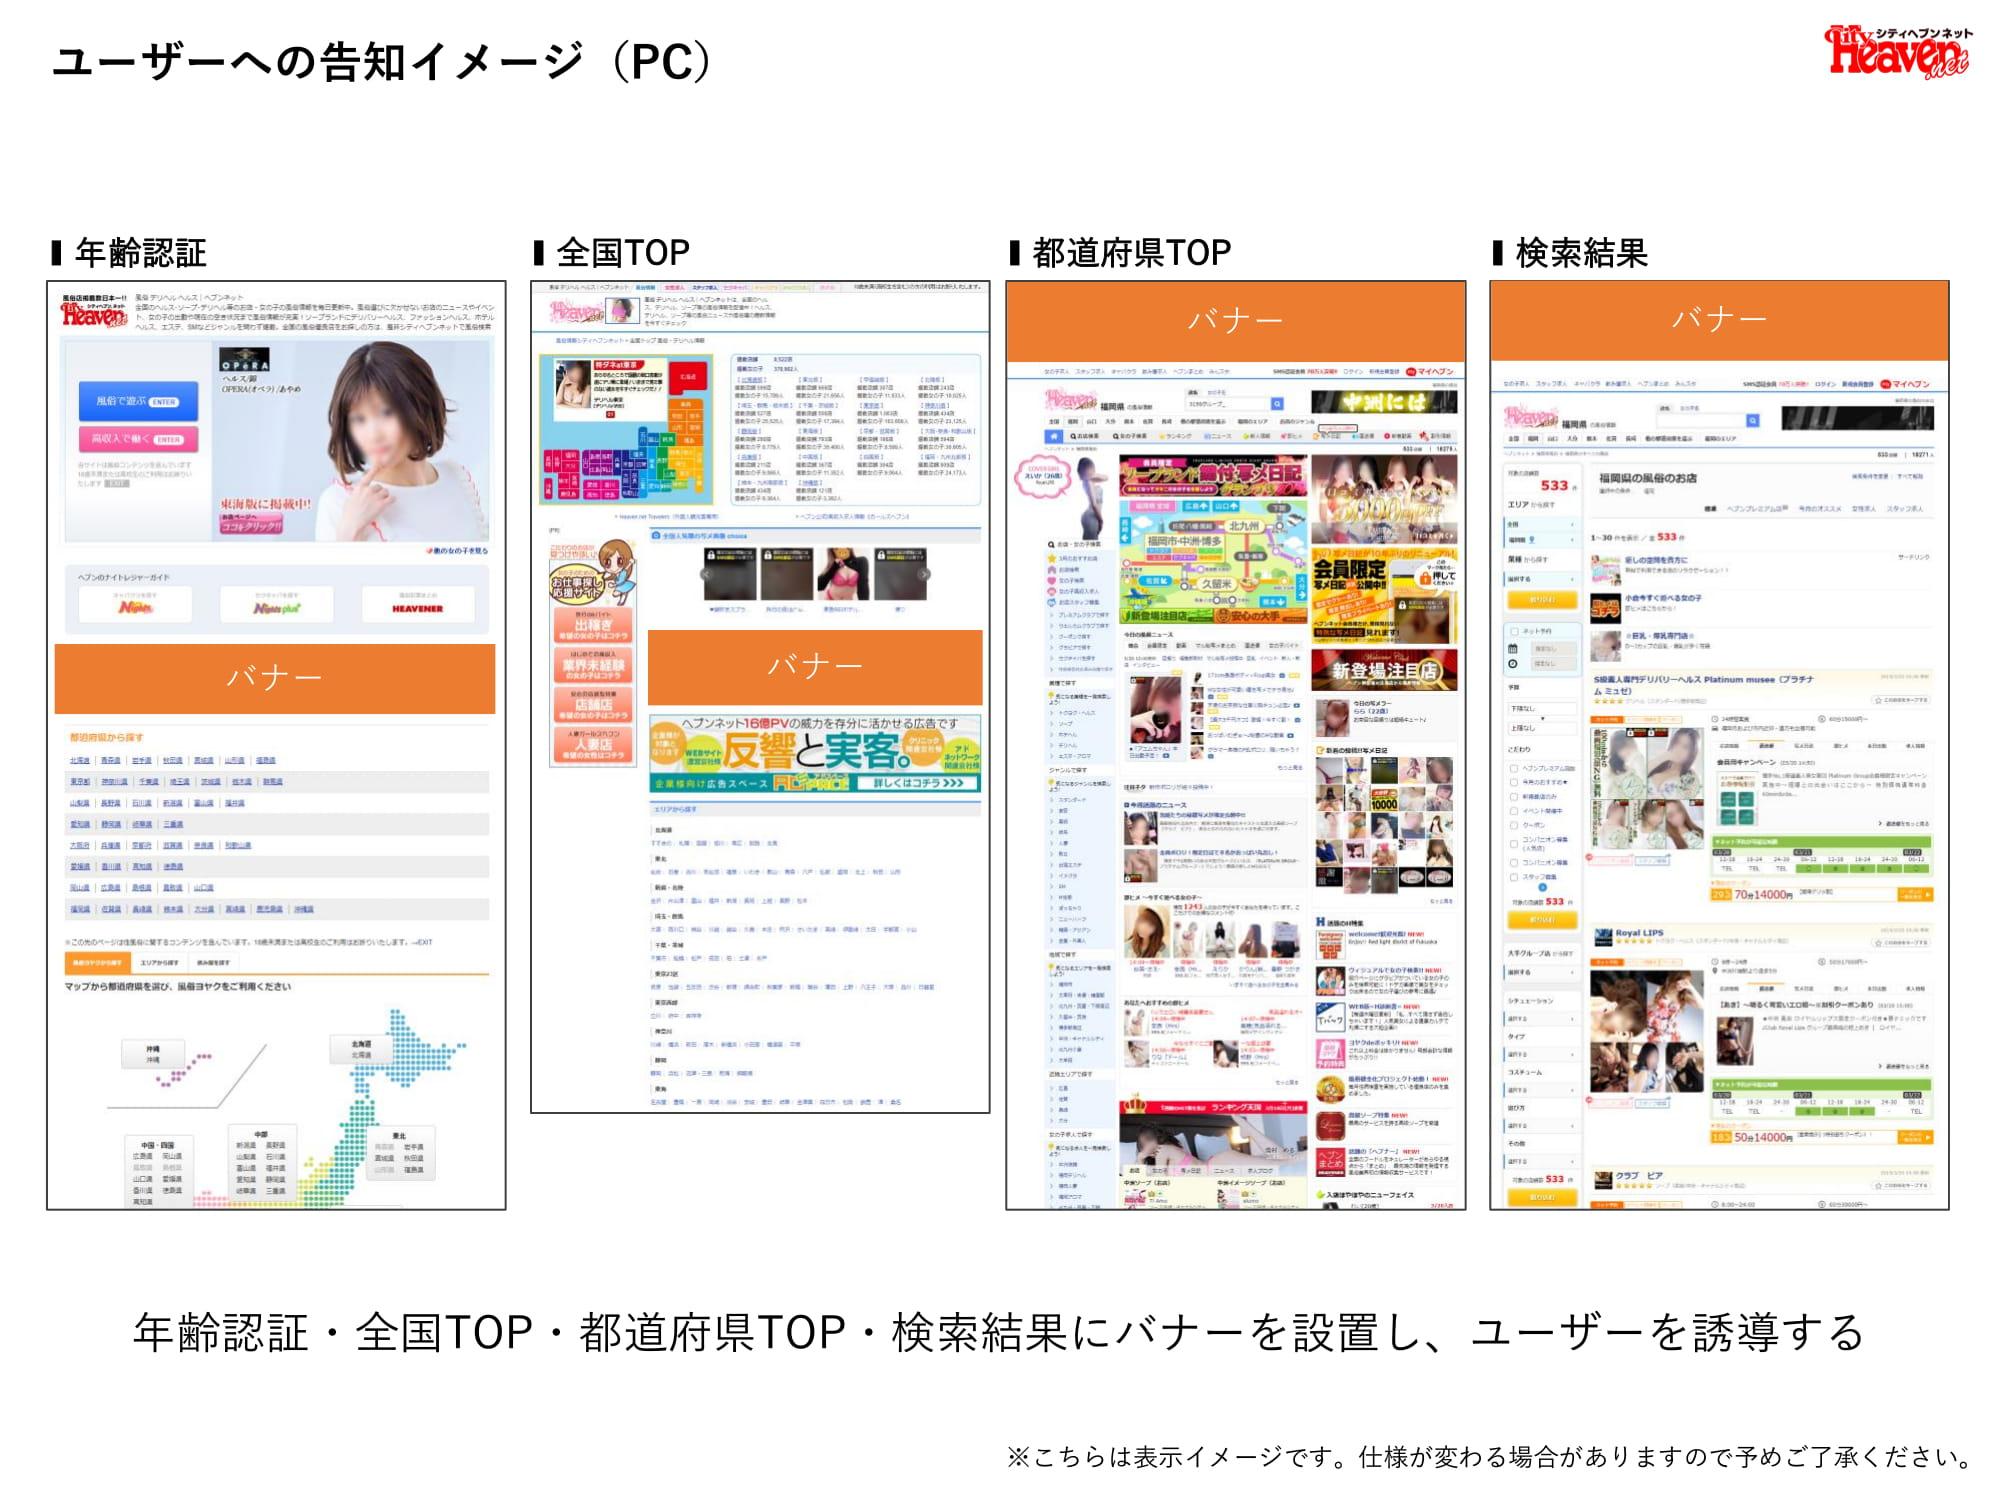 kuchikomi_kikaku-5.jpg